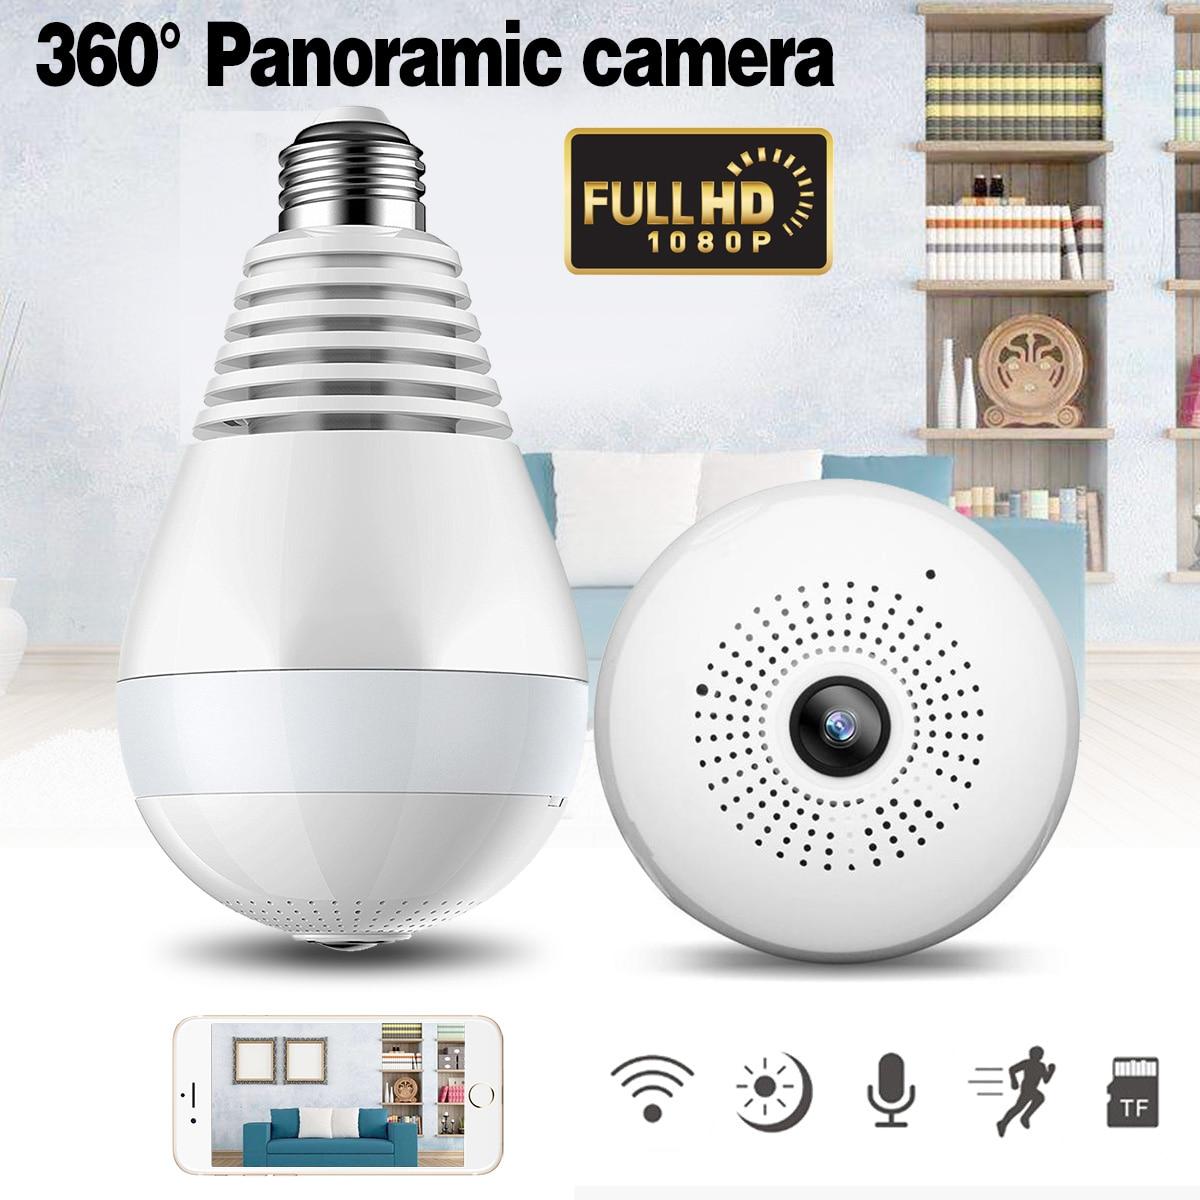 960 1080 p 360 grados cámara IP inalámbrica bombilla FishEye panorámica cámara casera 1.3MP seguridad P2P WiFi Cámara